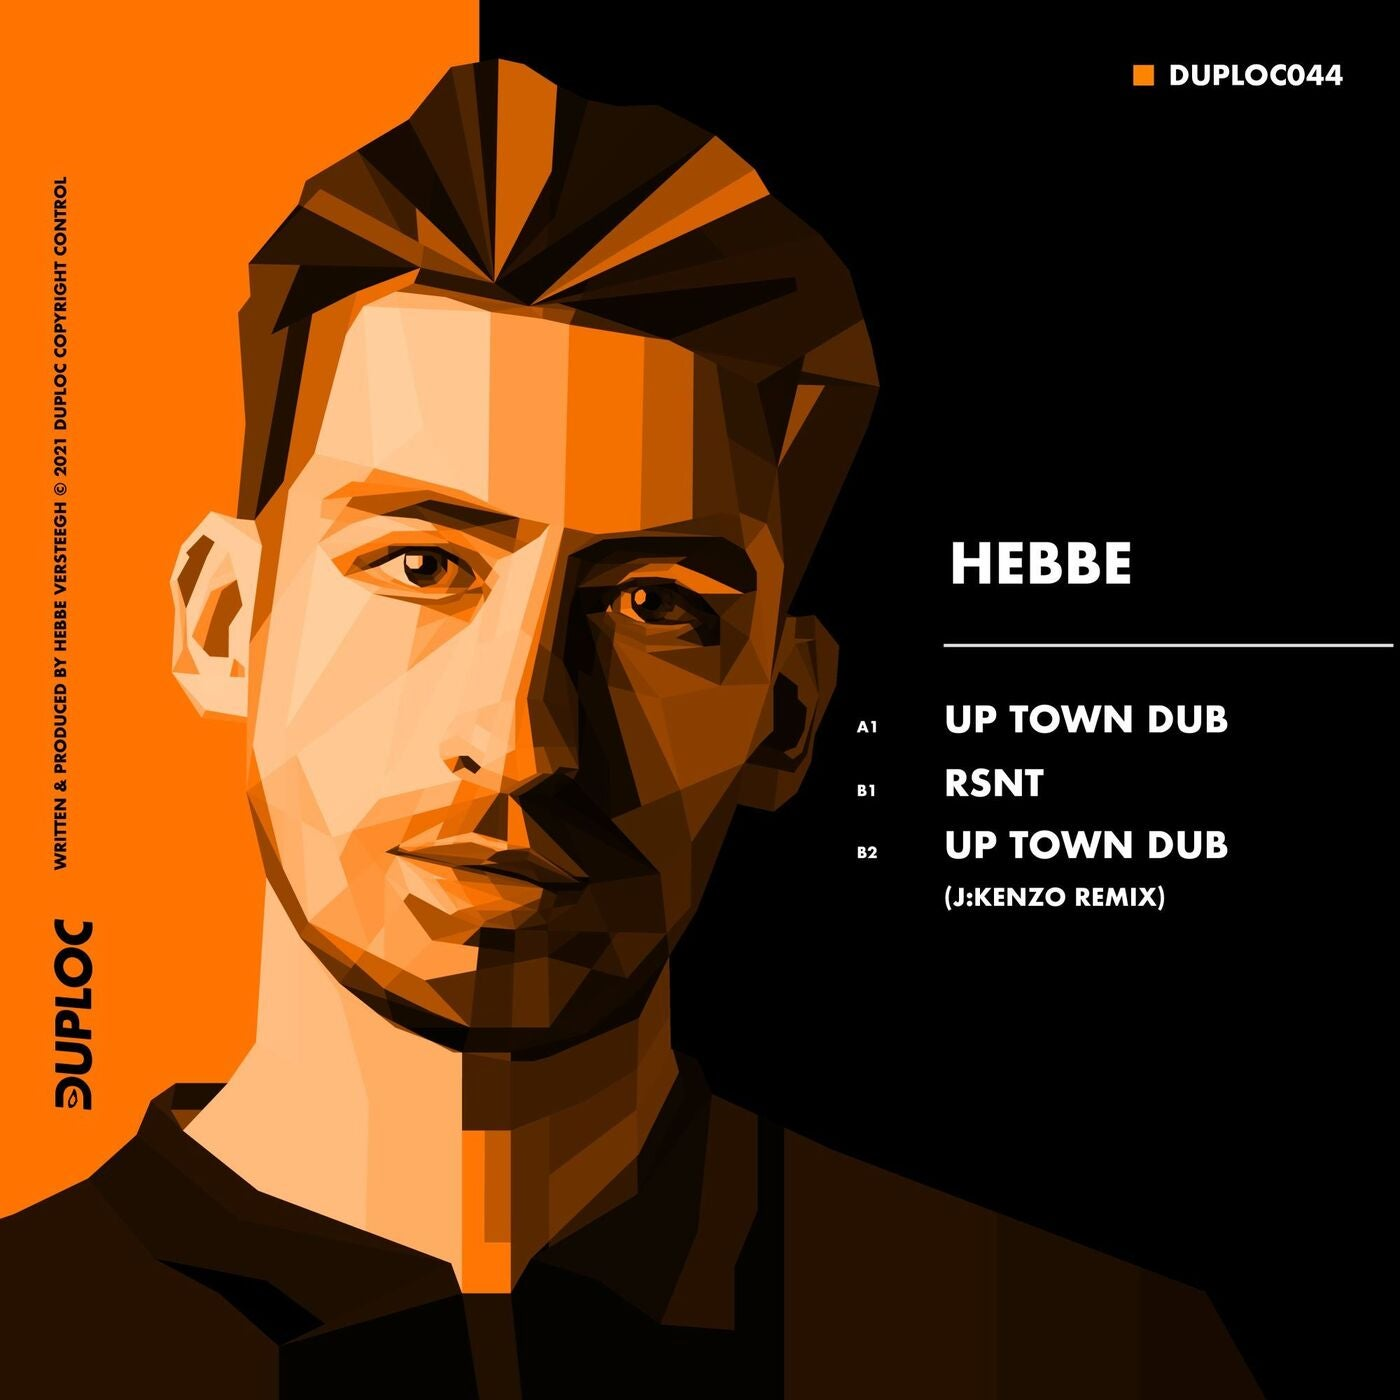 Up Town Dub (J:Kenzo Remix)